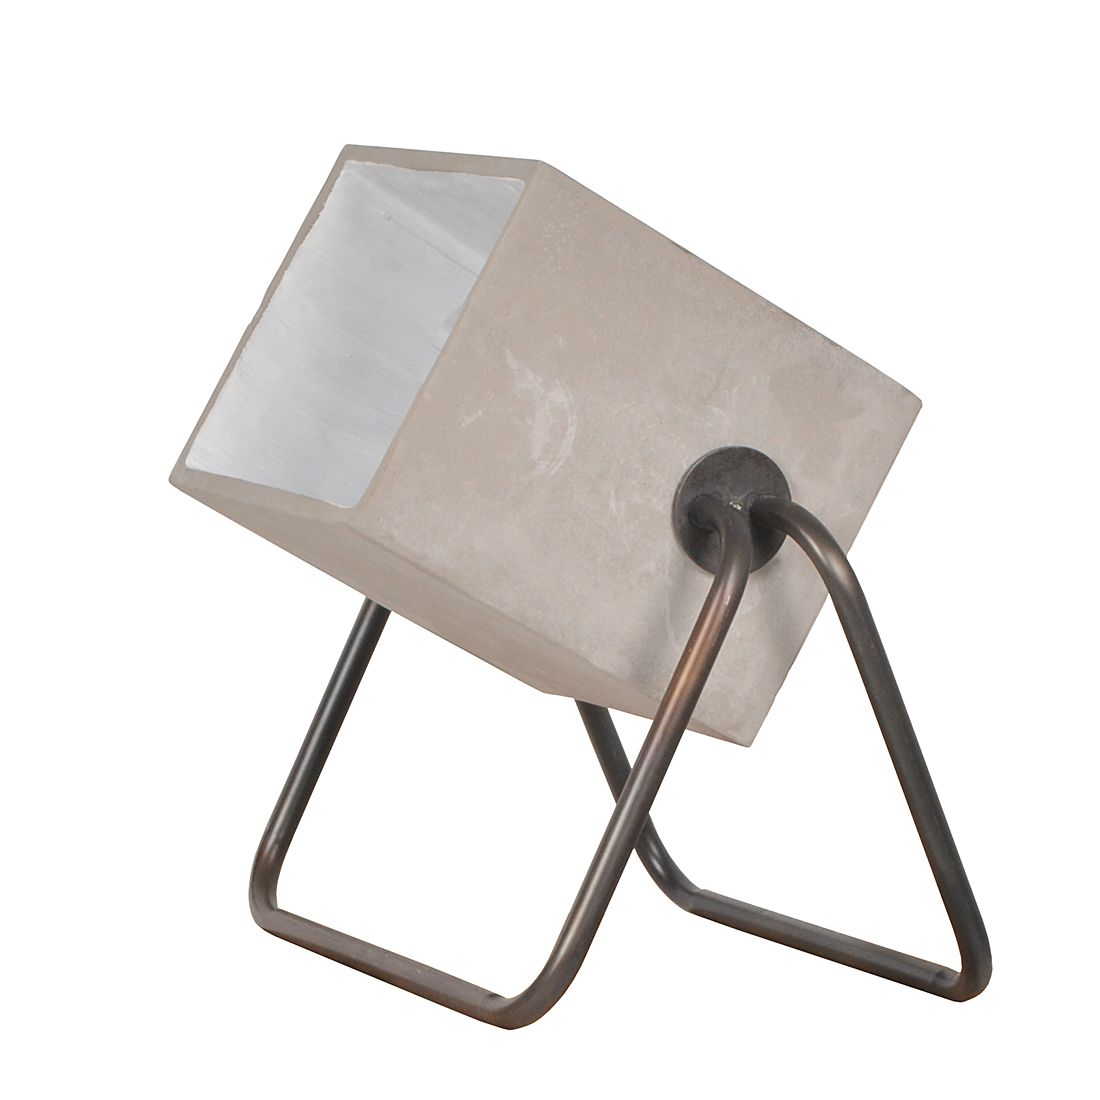 stehleuchte concrete up beton zuiver a g nstig bestellen. Black Bedroom Furniture Sets. Home Design Ideas